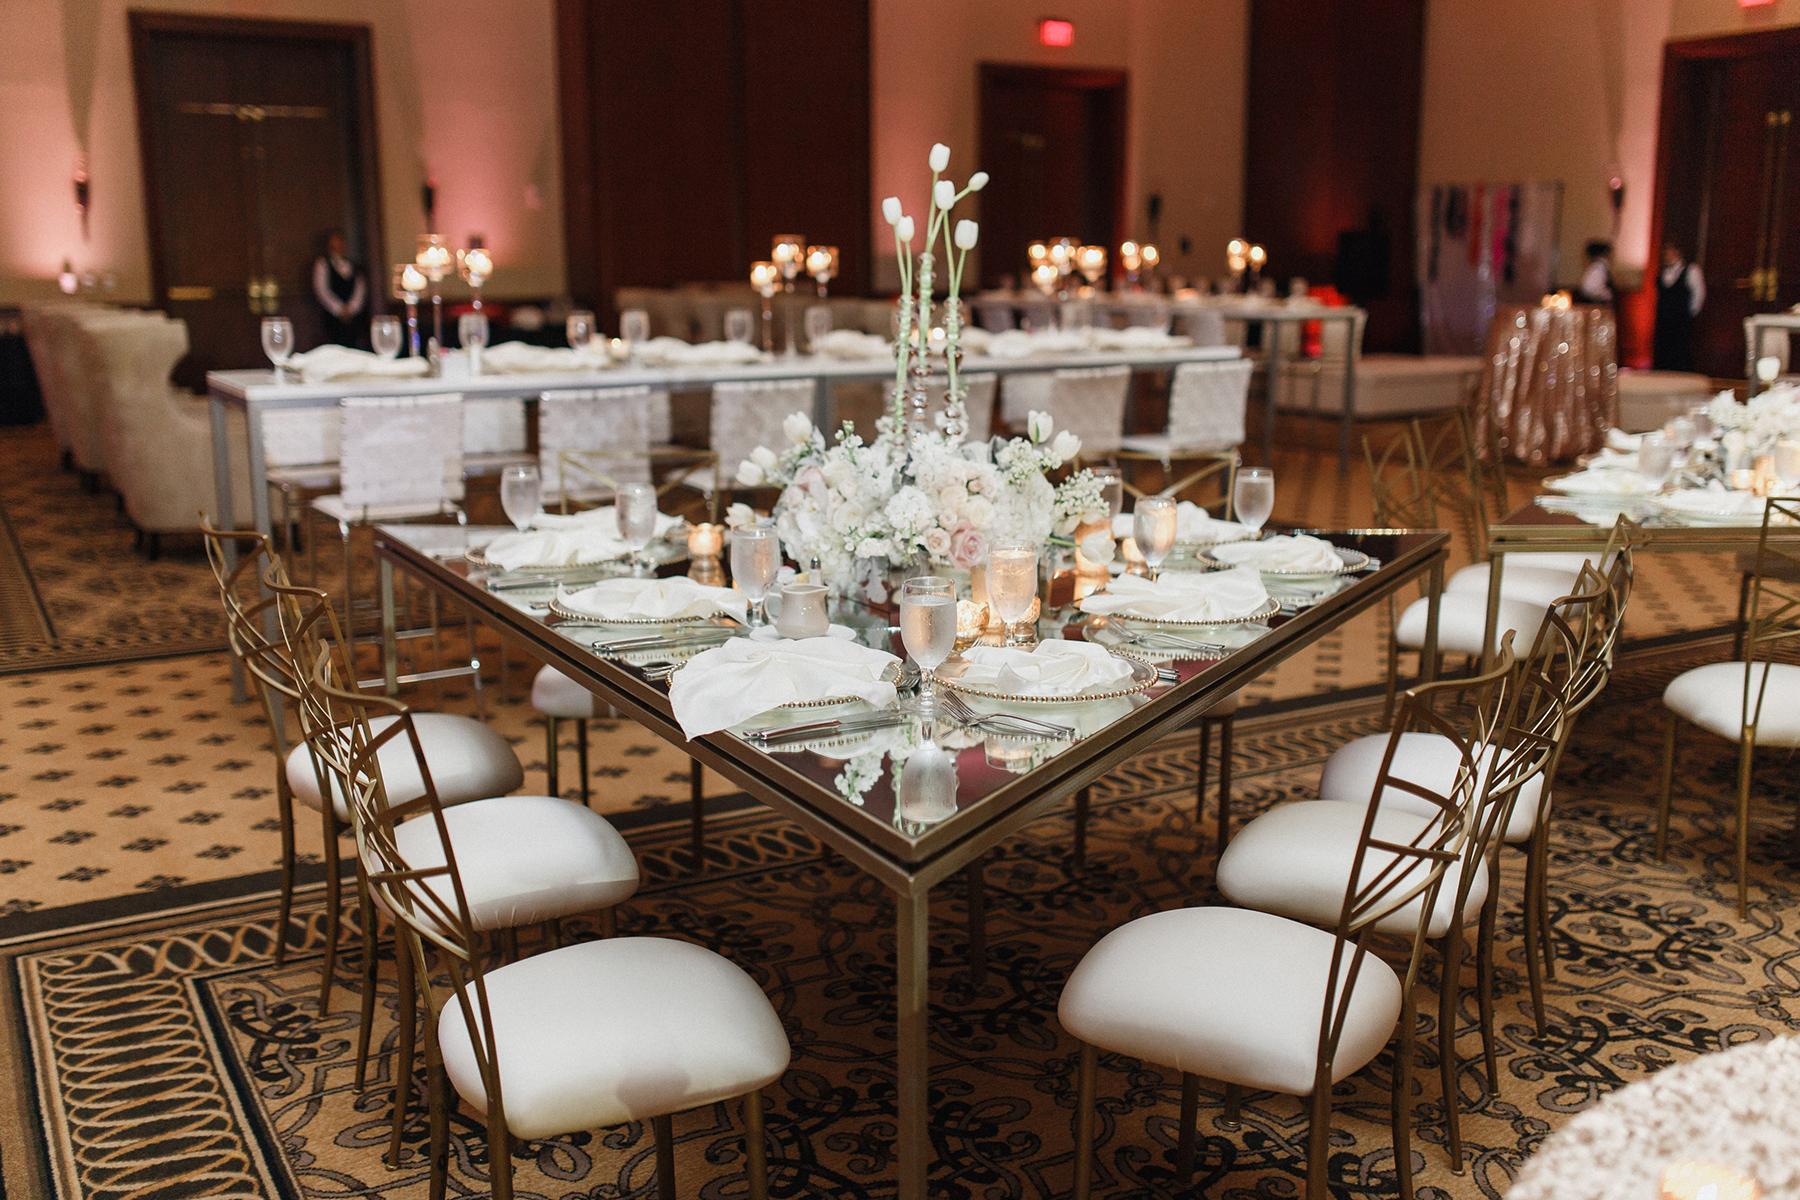 daytoremember.net | Daniel Colvin Photography | The Omni Hotel Houston Galleria | Houston, Texas | A Day To Remember Houston Luxury Wedding Planning and Design